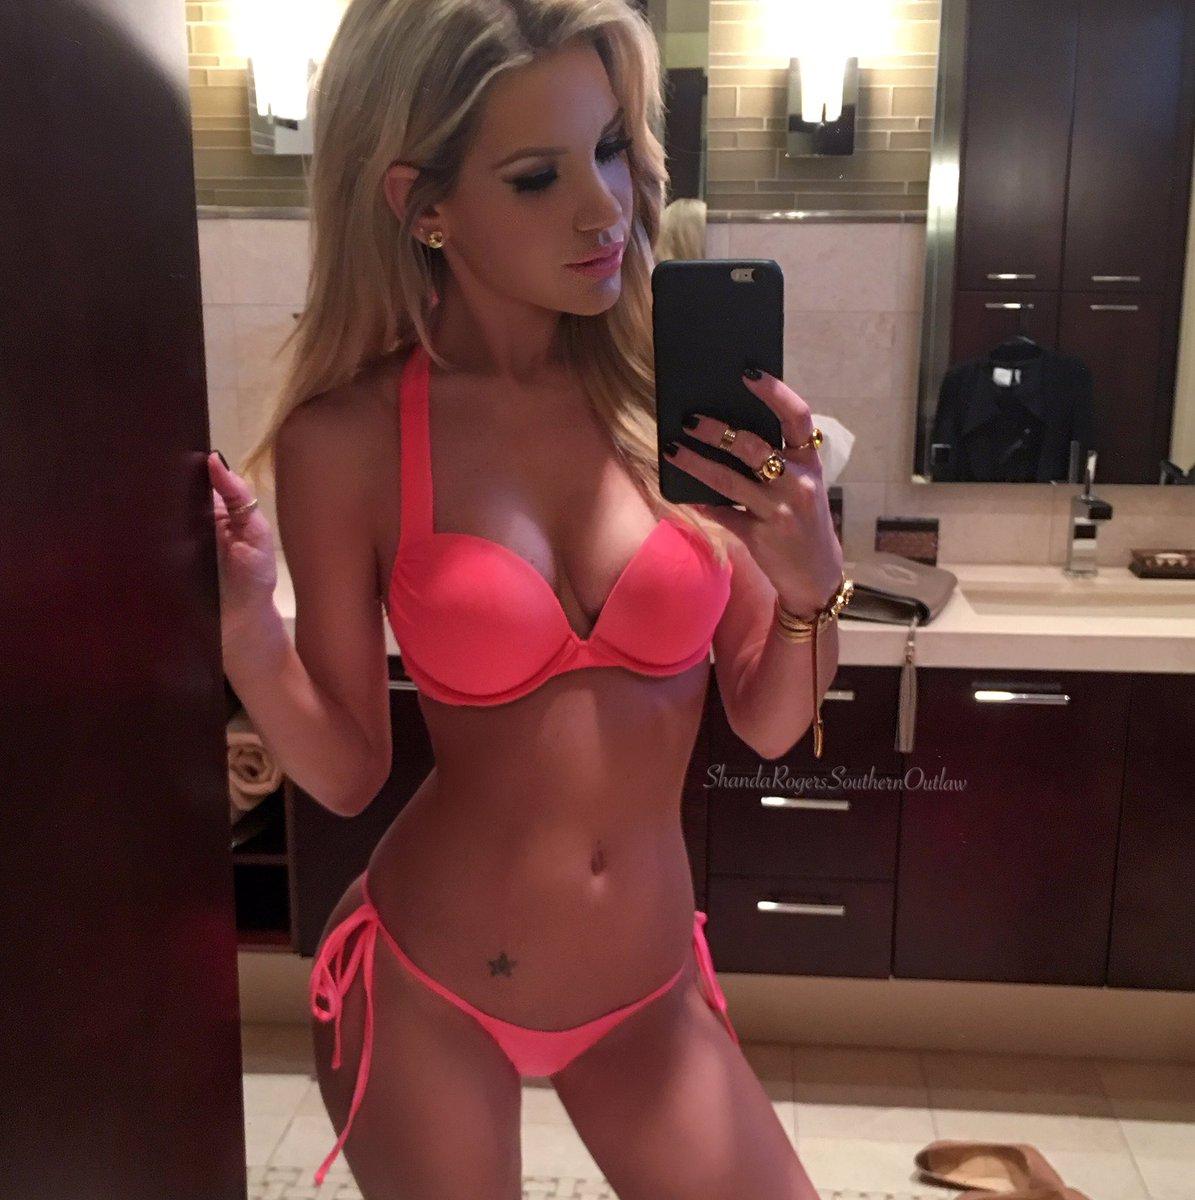 Shanda rogers on twitter goodmorning this bikini makes for Emily addison nyc